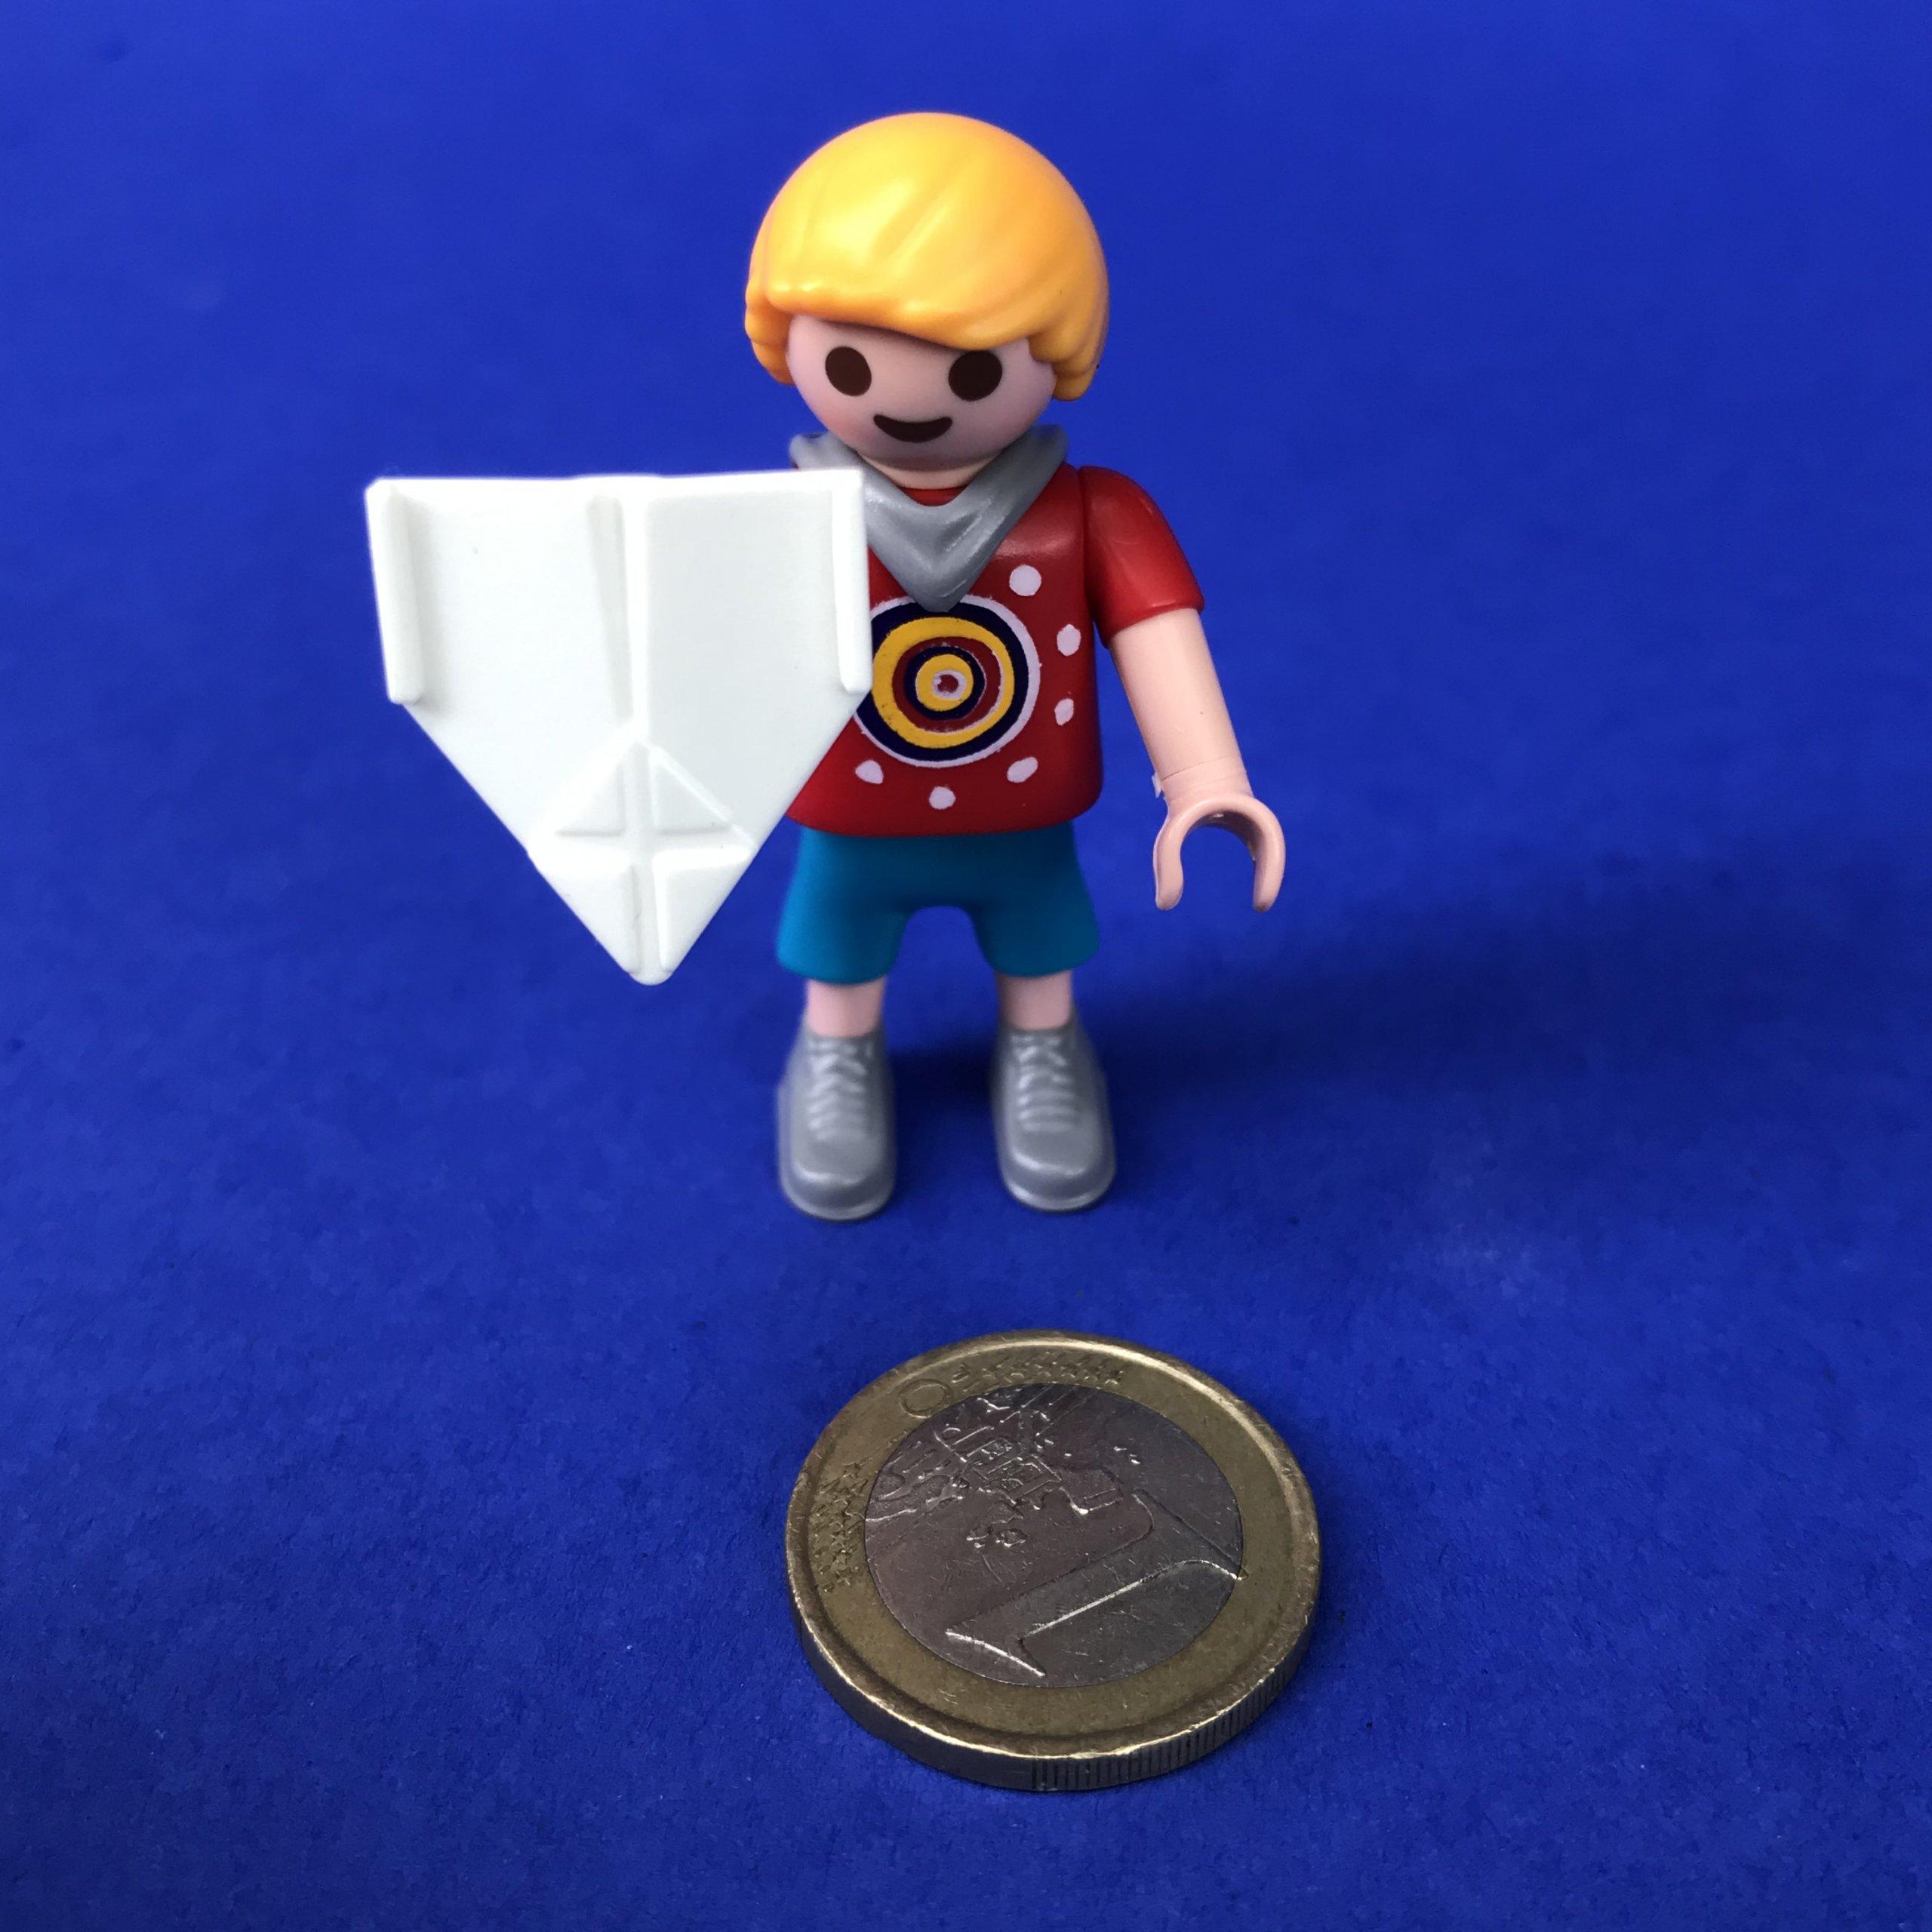 Playmobil-jongetje-vliegtuig